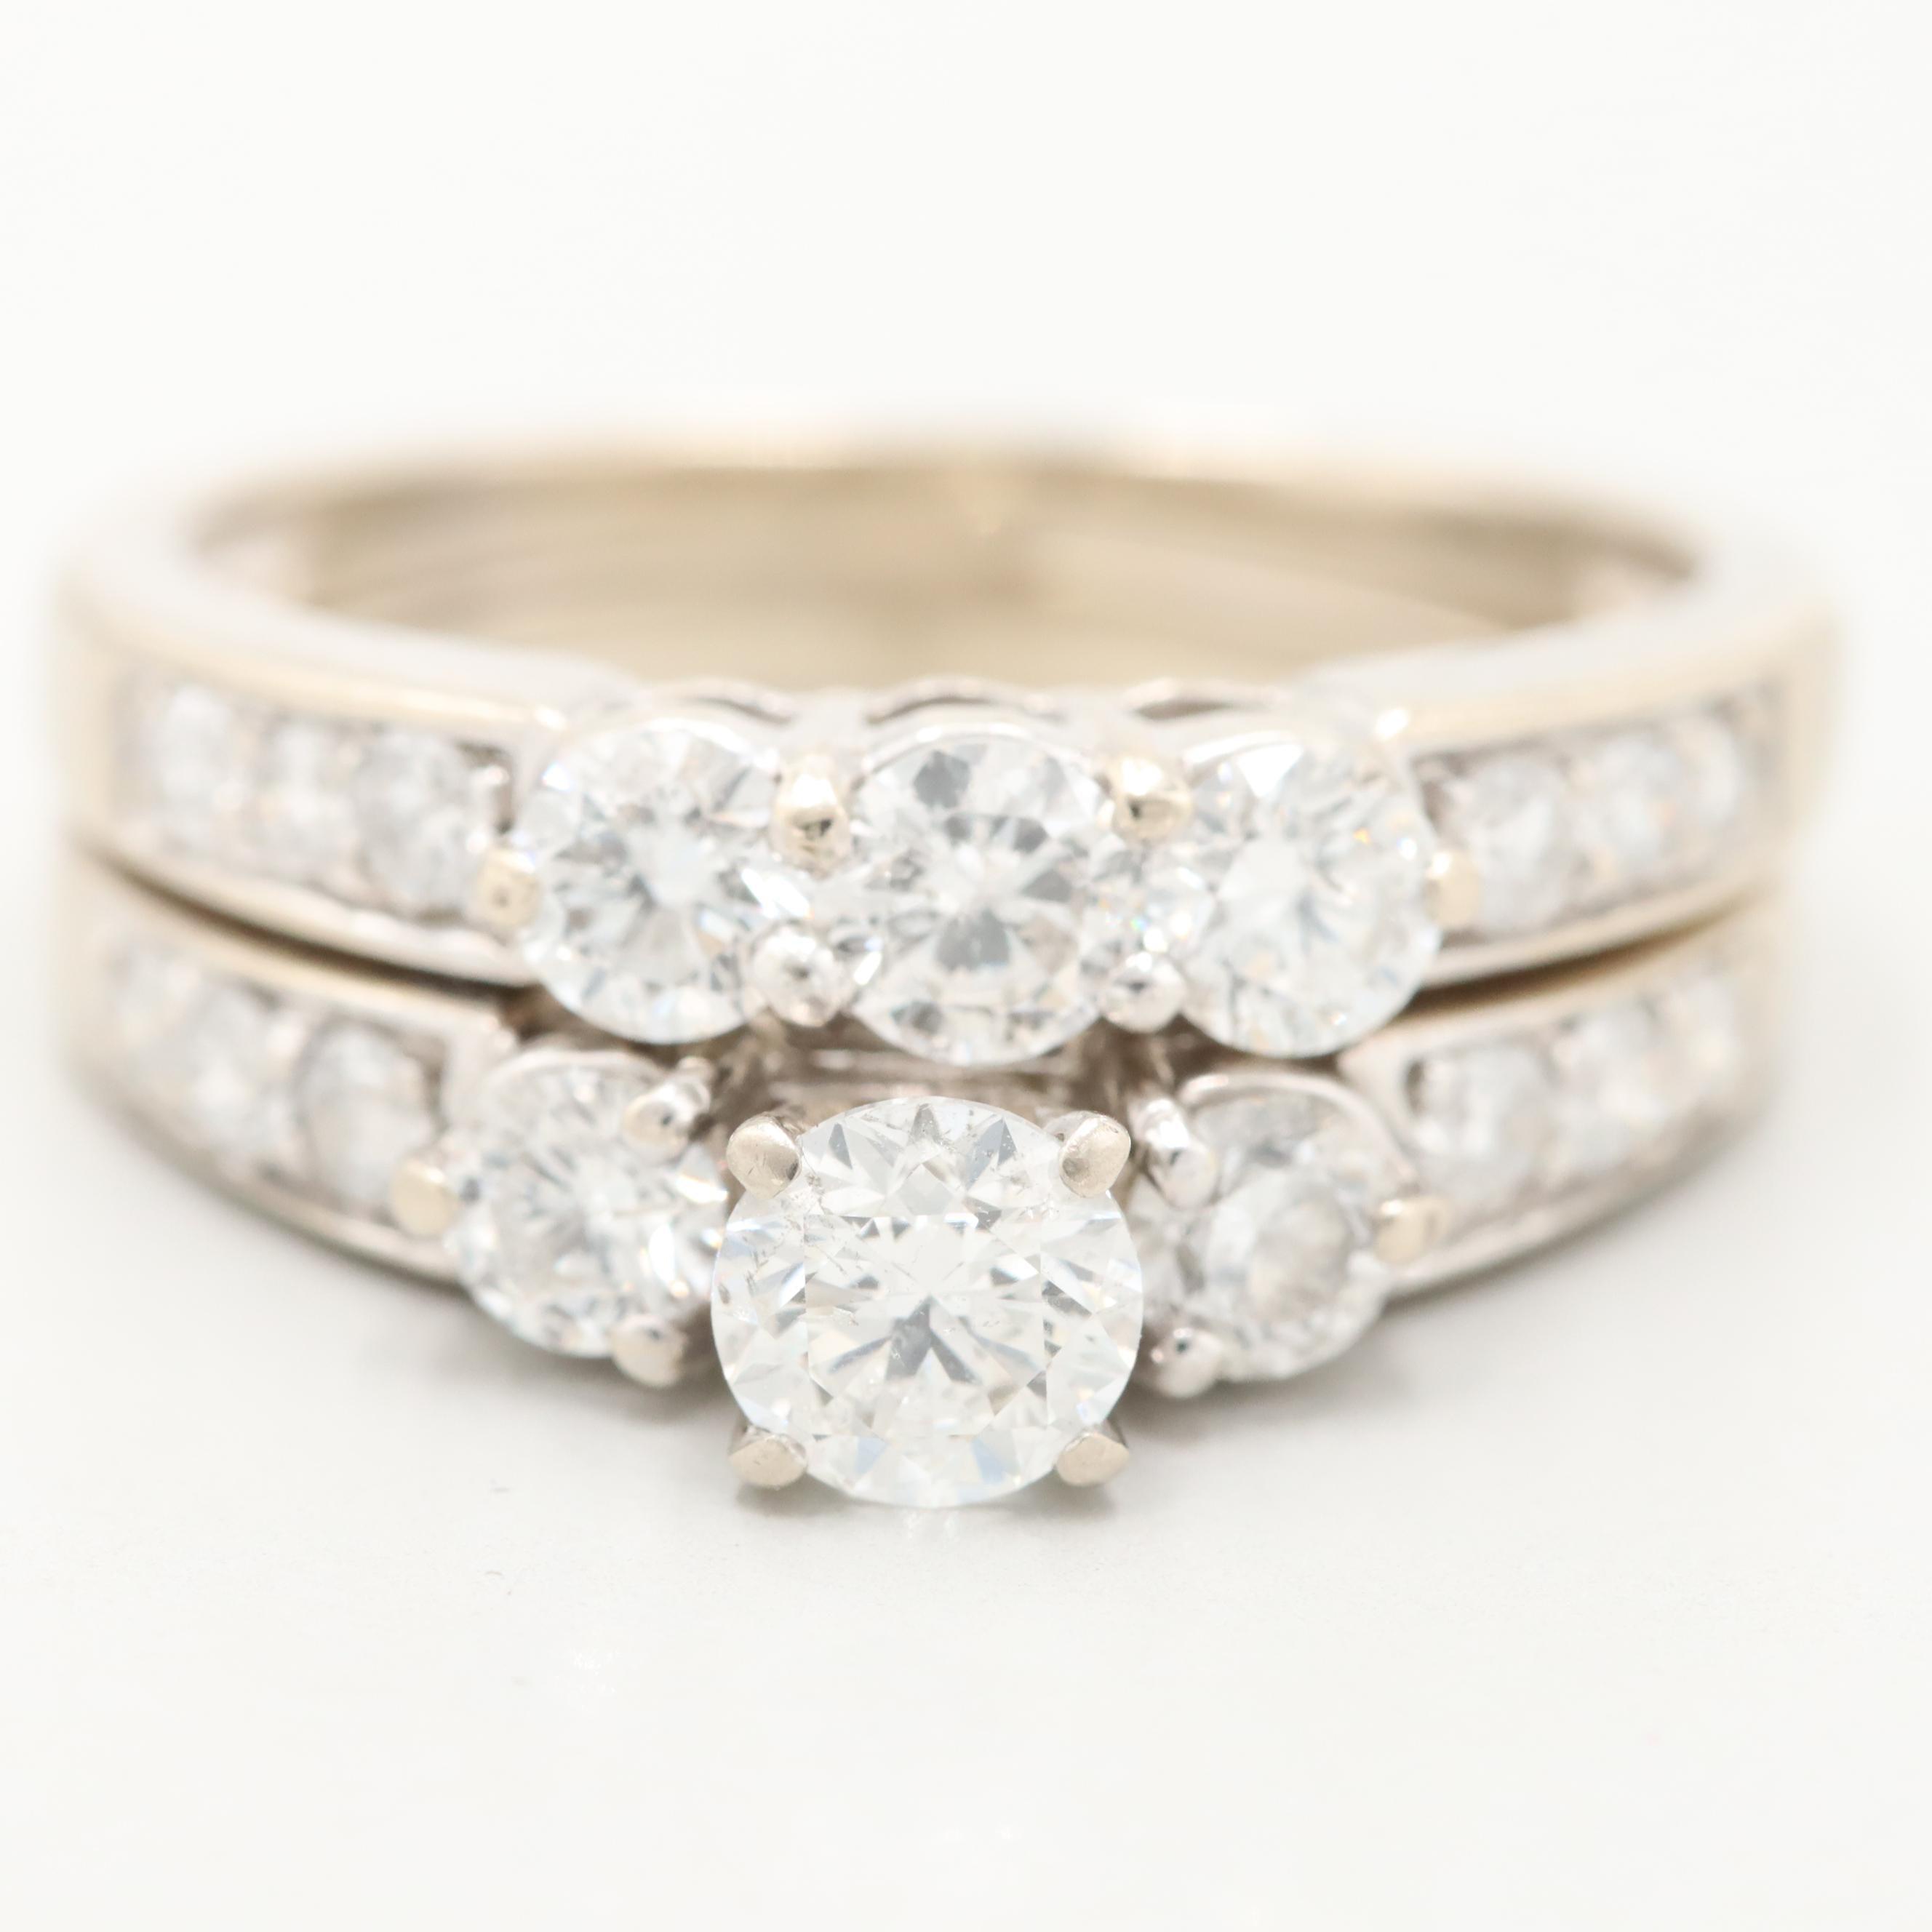 14K White Gold 1.59 CTW Diamond Ring